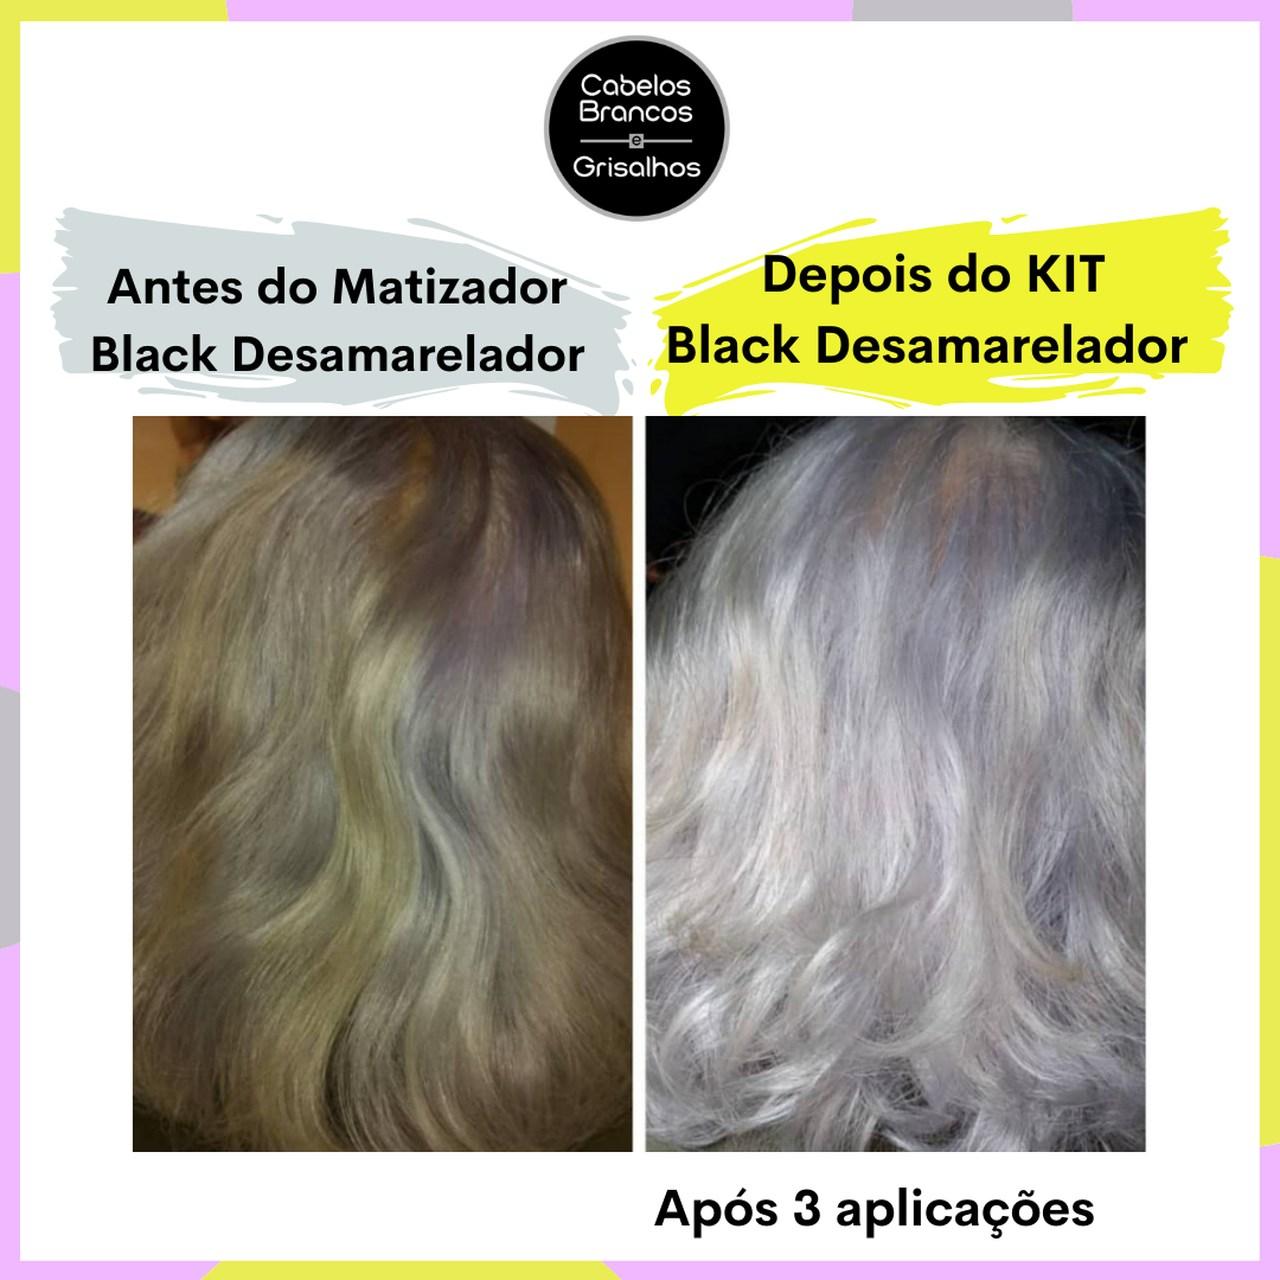 Shampoo Cabelos Grisalhos, Condicionador, Matizador e Leave-in Desamarelador para Cabelos Brancos e Grisalhos (Kit Black Desamarelador 4 passos)